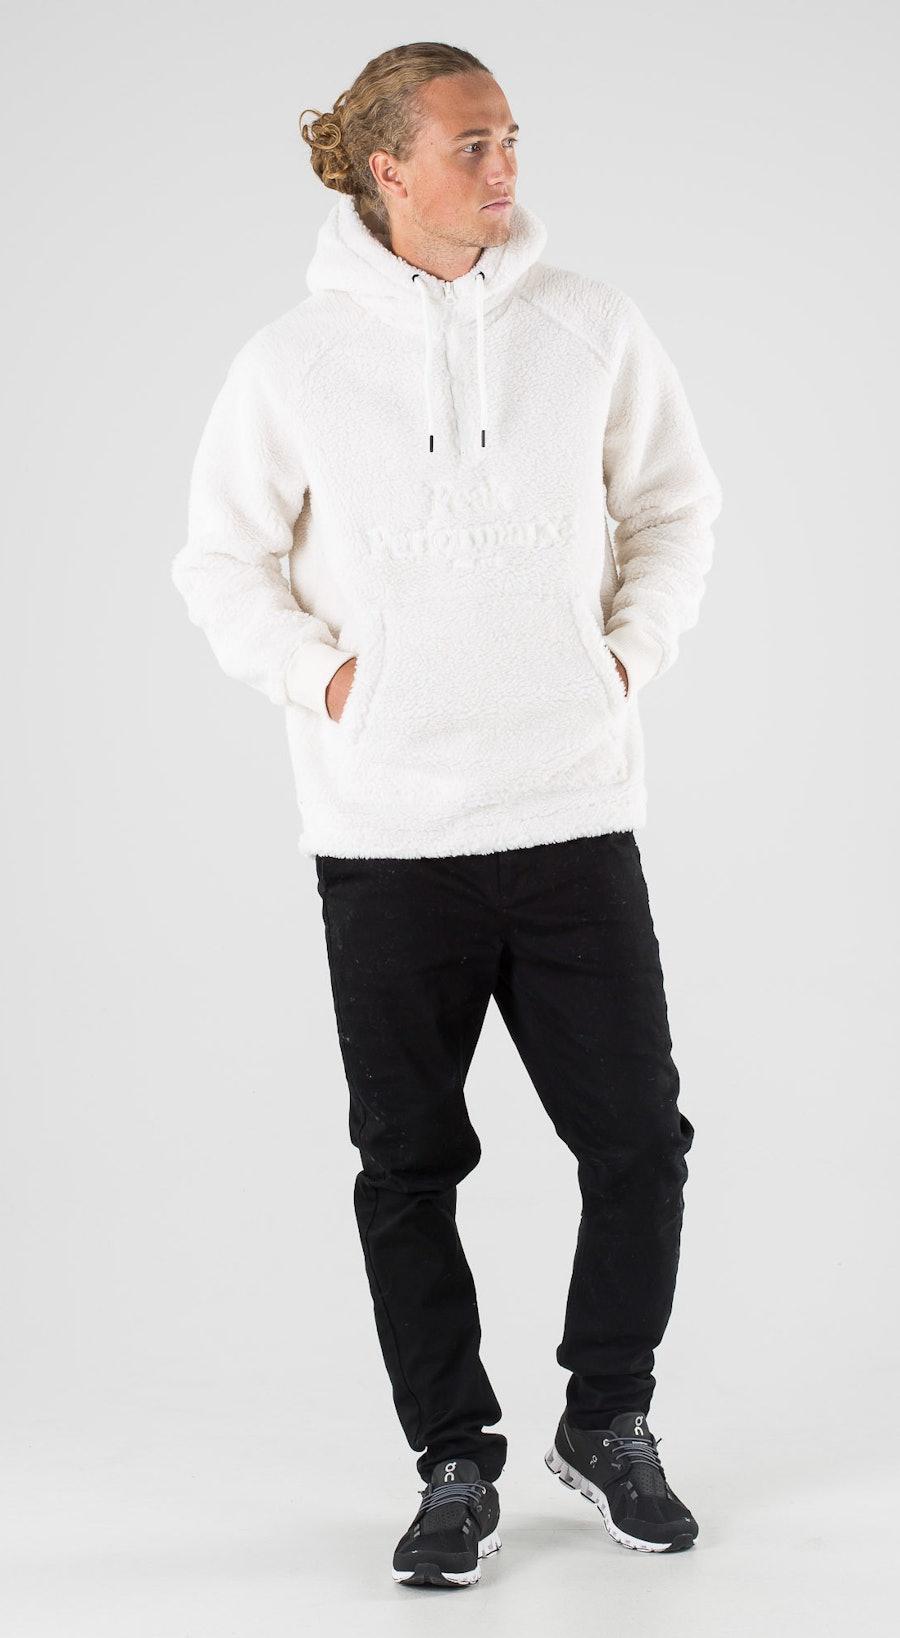 Peak Performance Original Pile Zip Off White Outfit Multi